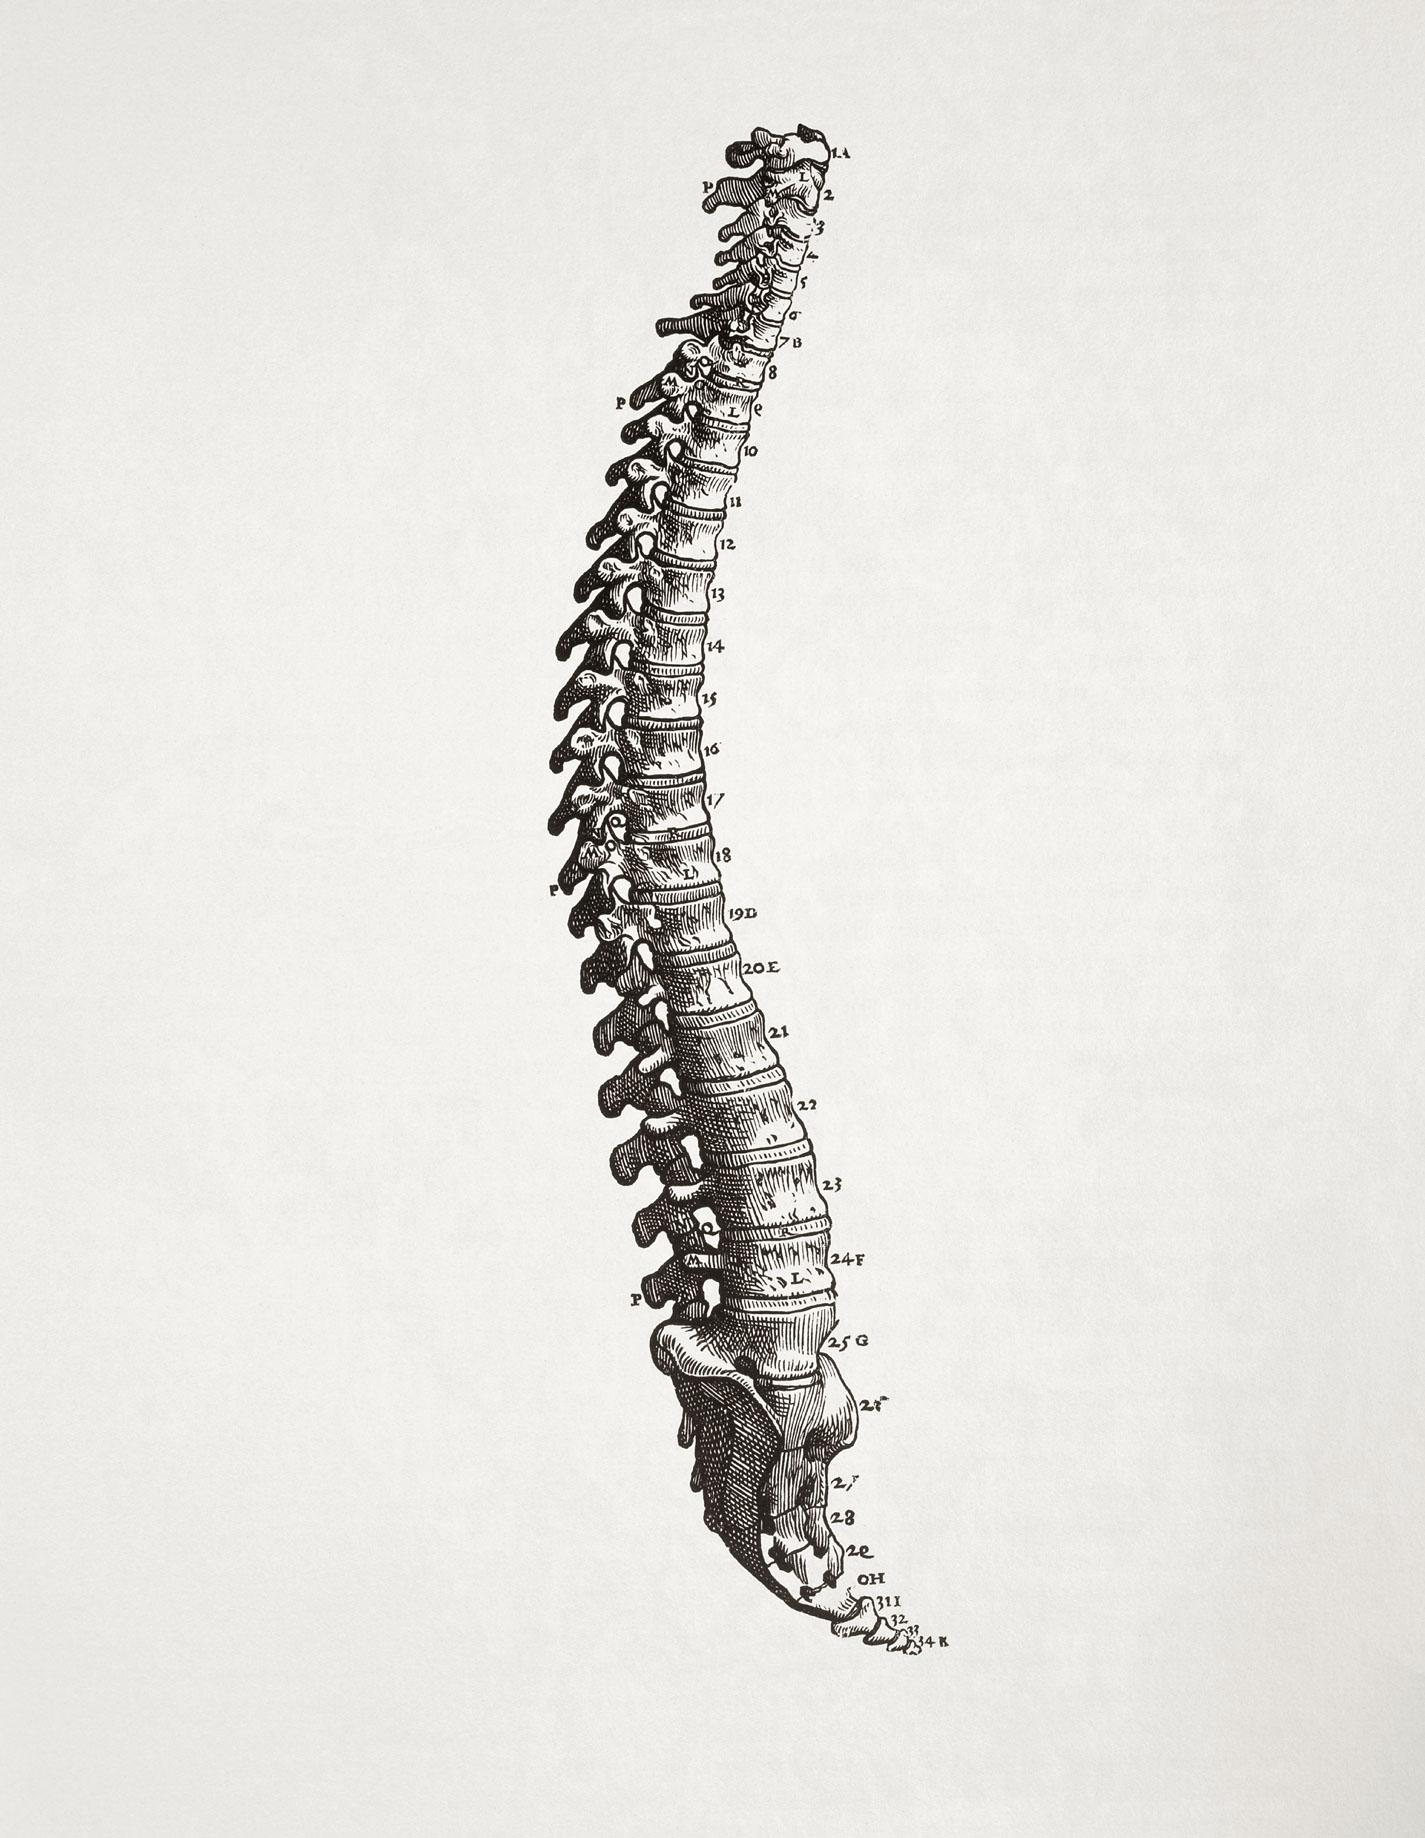 47 Human Anatomy Wallpaper On Wallpapersafari